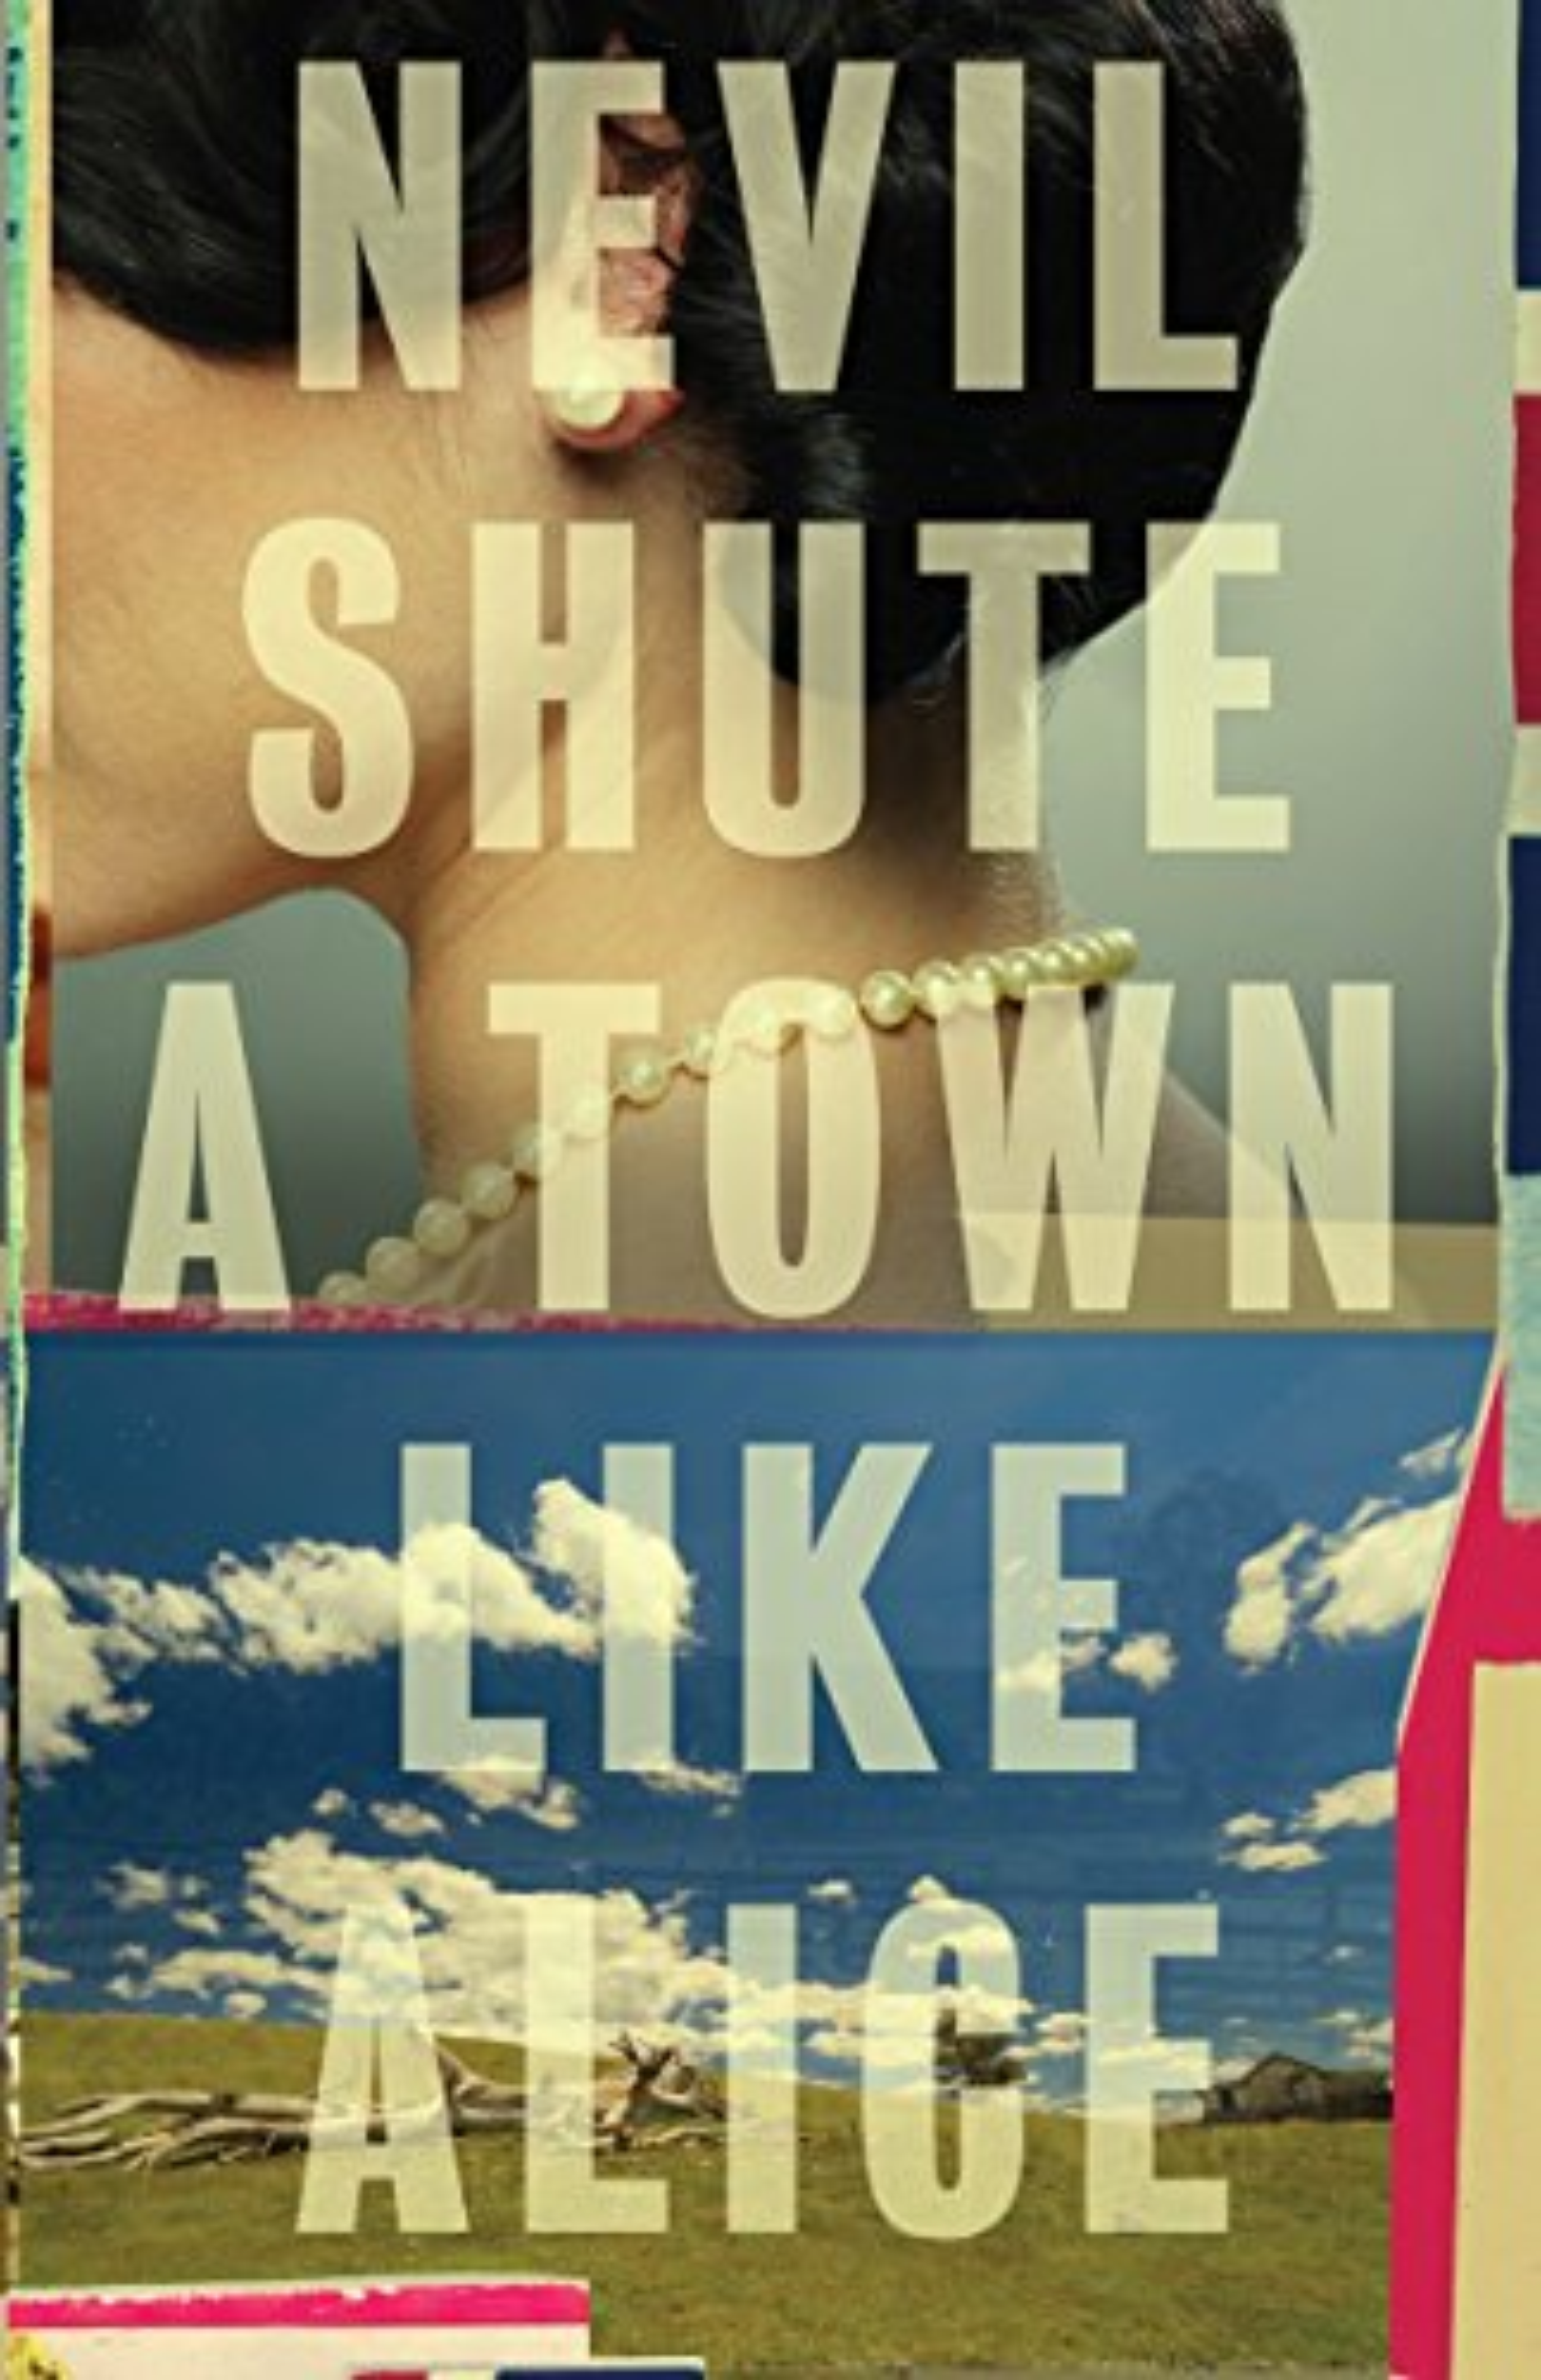 A Town Like Alice (Vintage International) by Nevil Shute